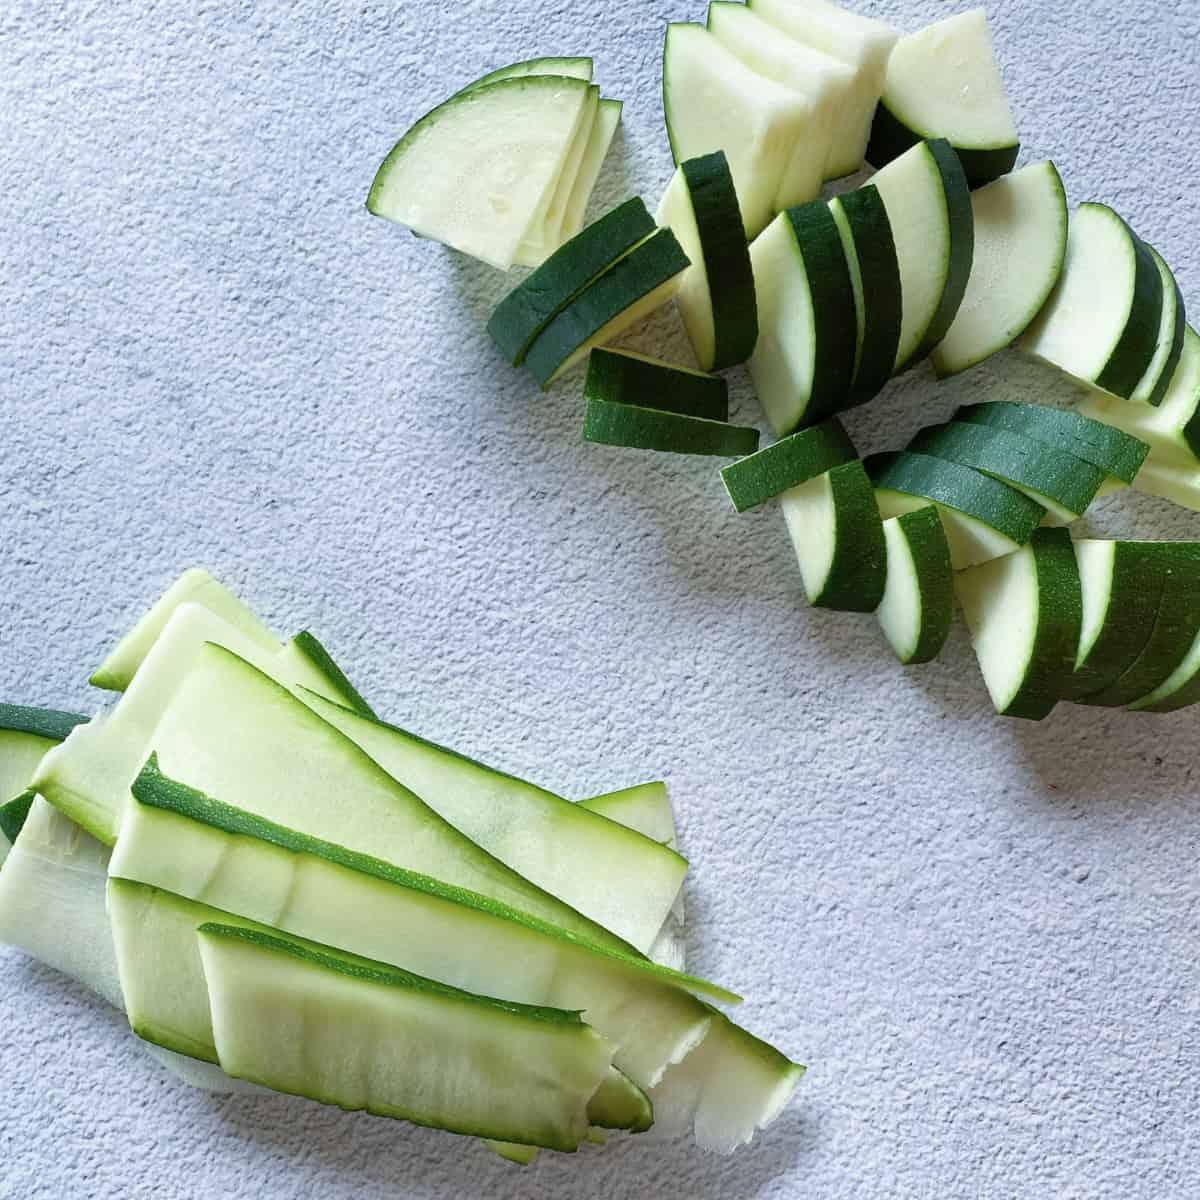 cut and quartered zucchini and zucchini ribbons